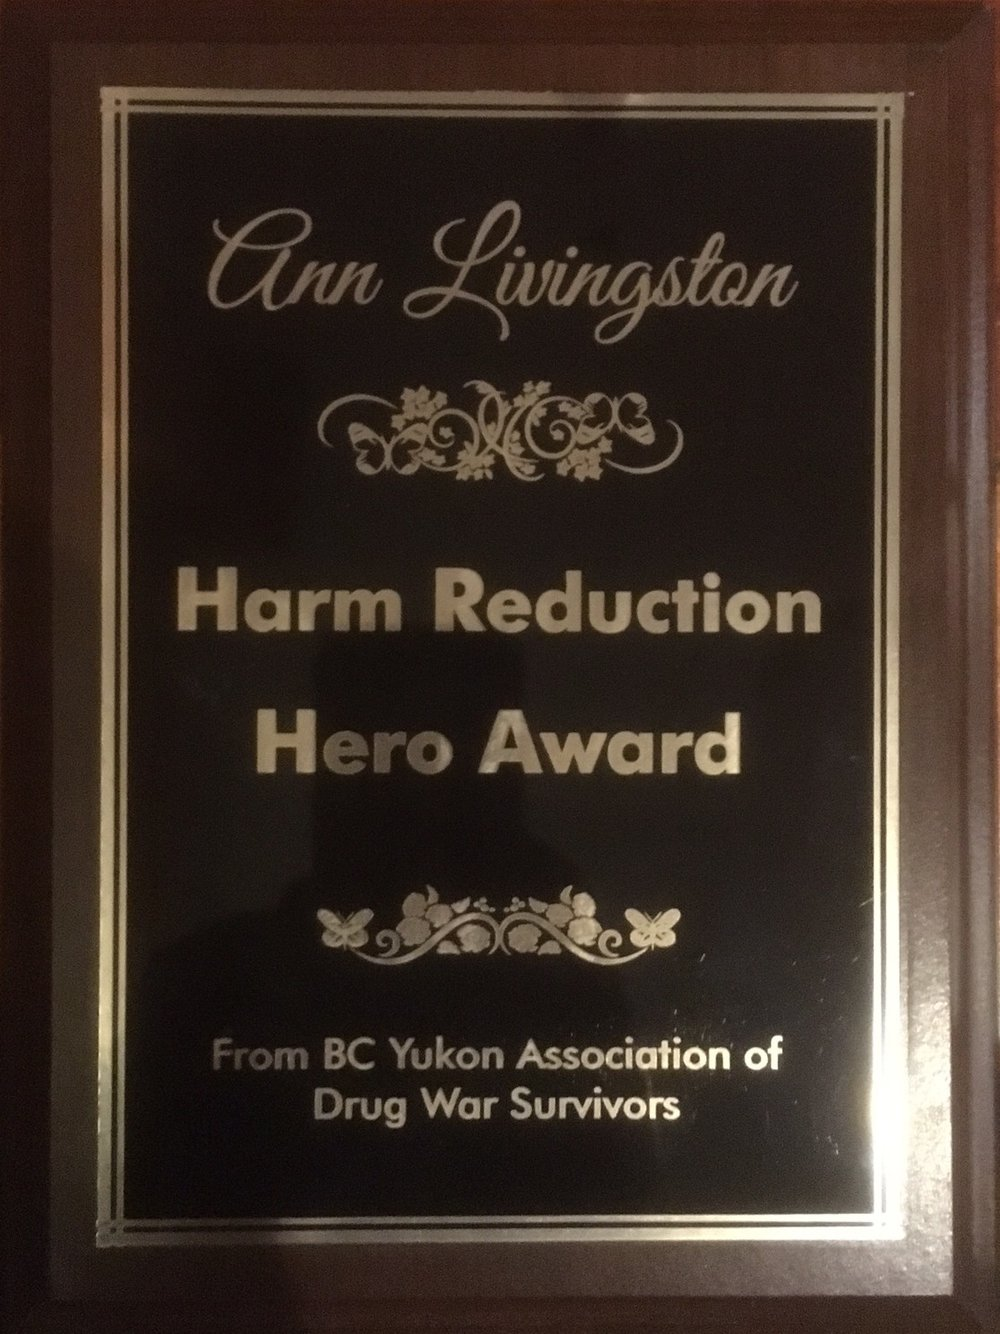 Drug User Groups and Community Resilience - Abbotsford - Harm Reduction Hero Award -  Dec 6,  2017 (2)_cr.jpg